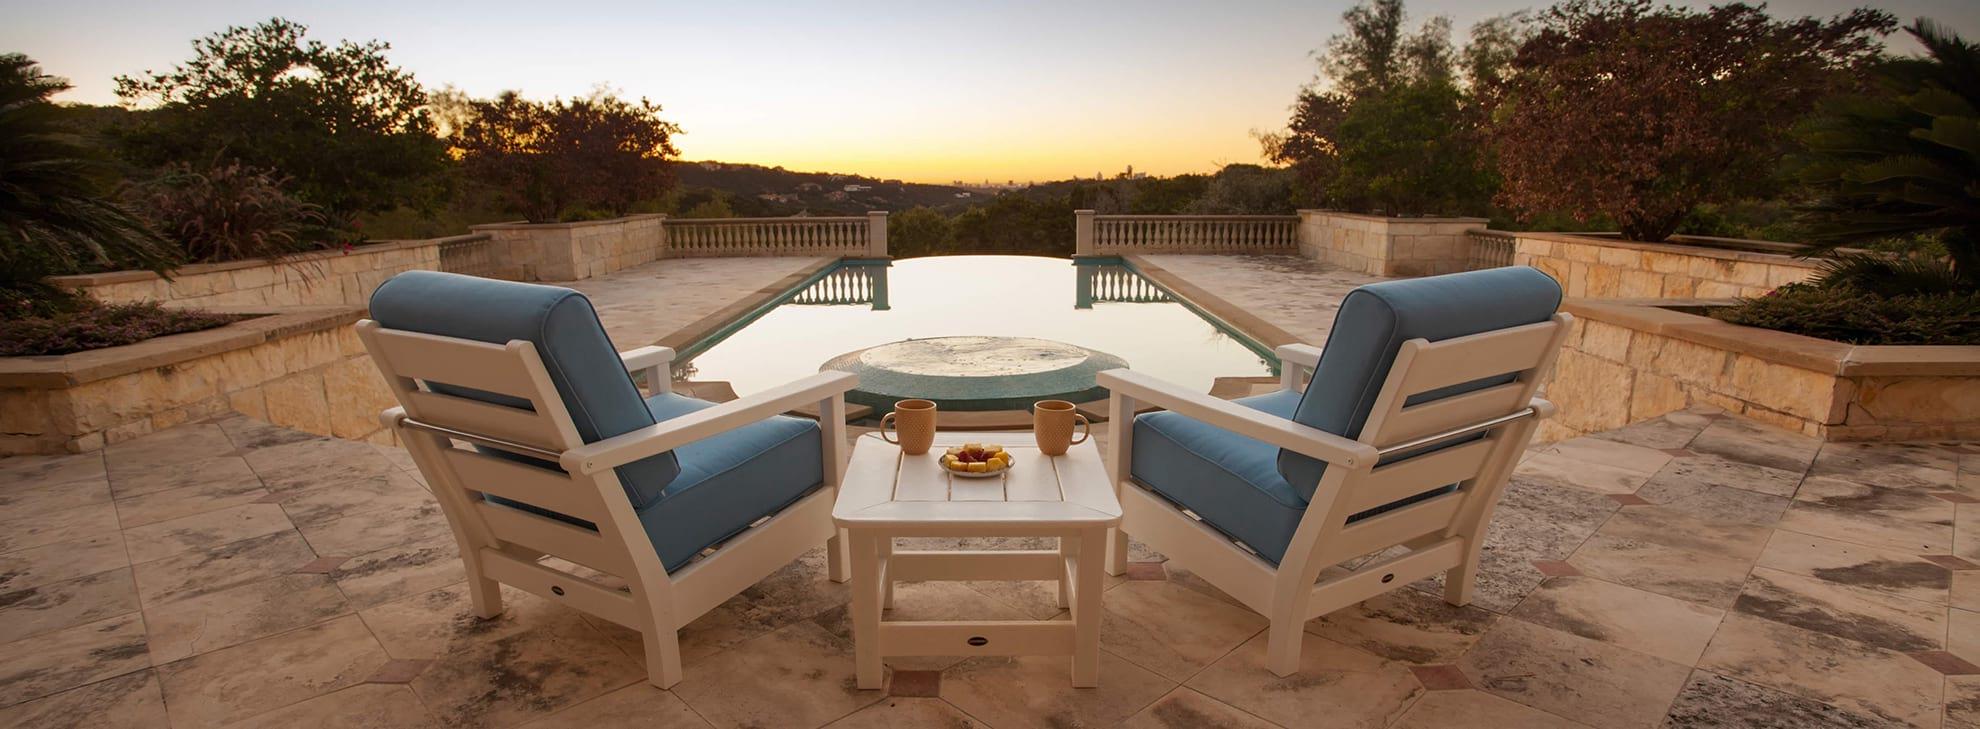 outdoor deep seating polywood